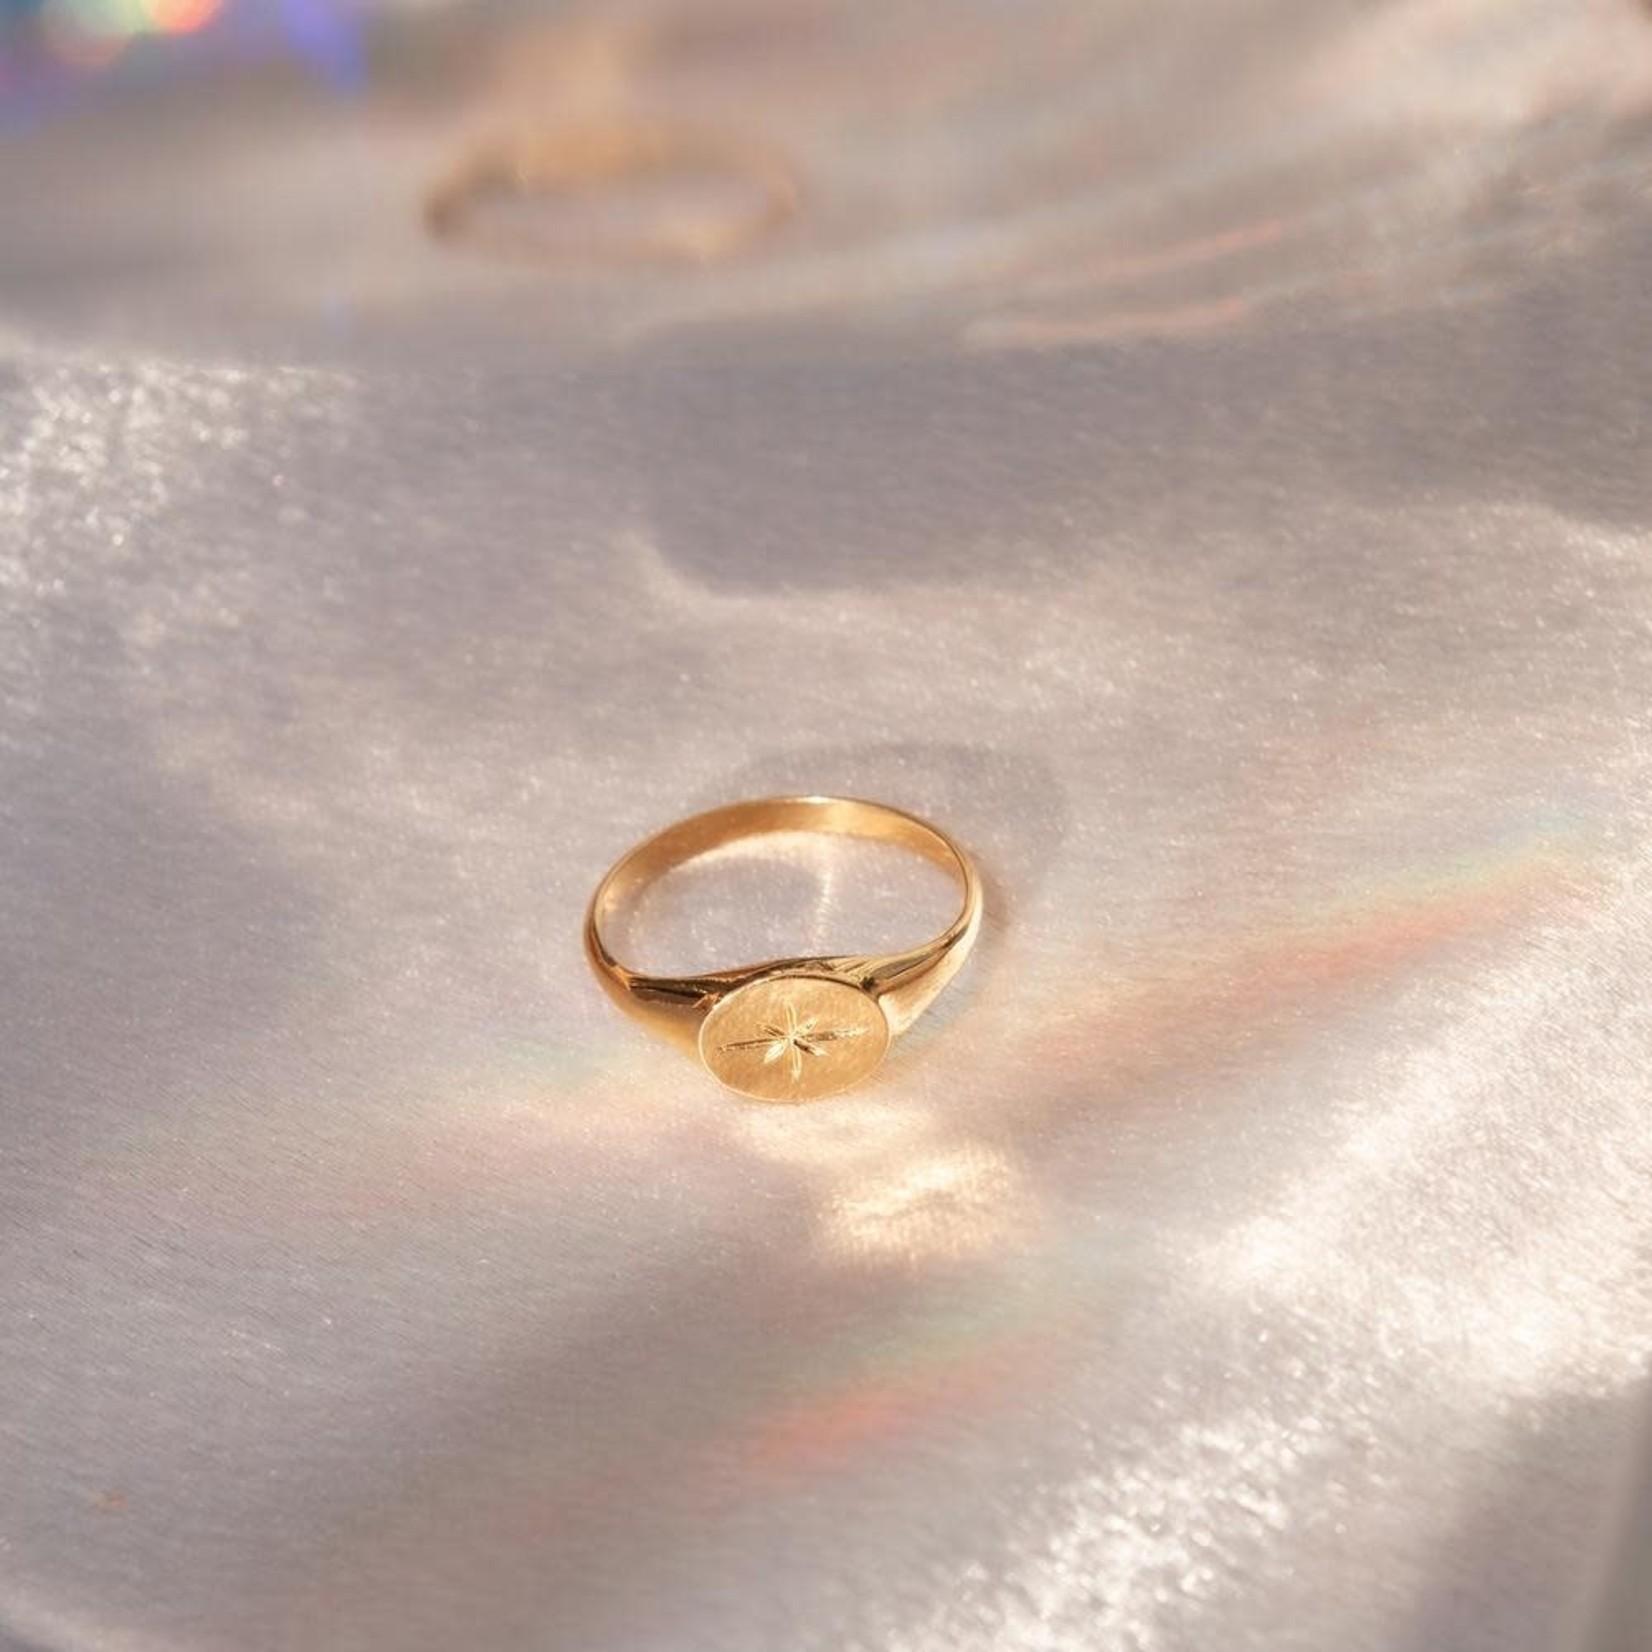 Welldunn jewelry Welldunn bague SIRIUS or